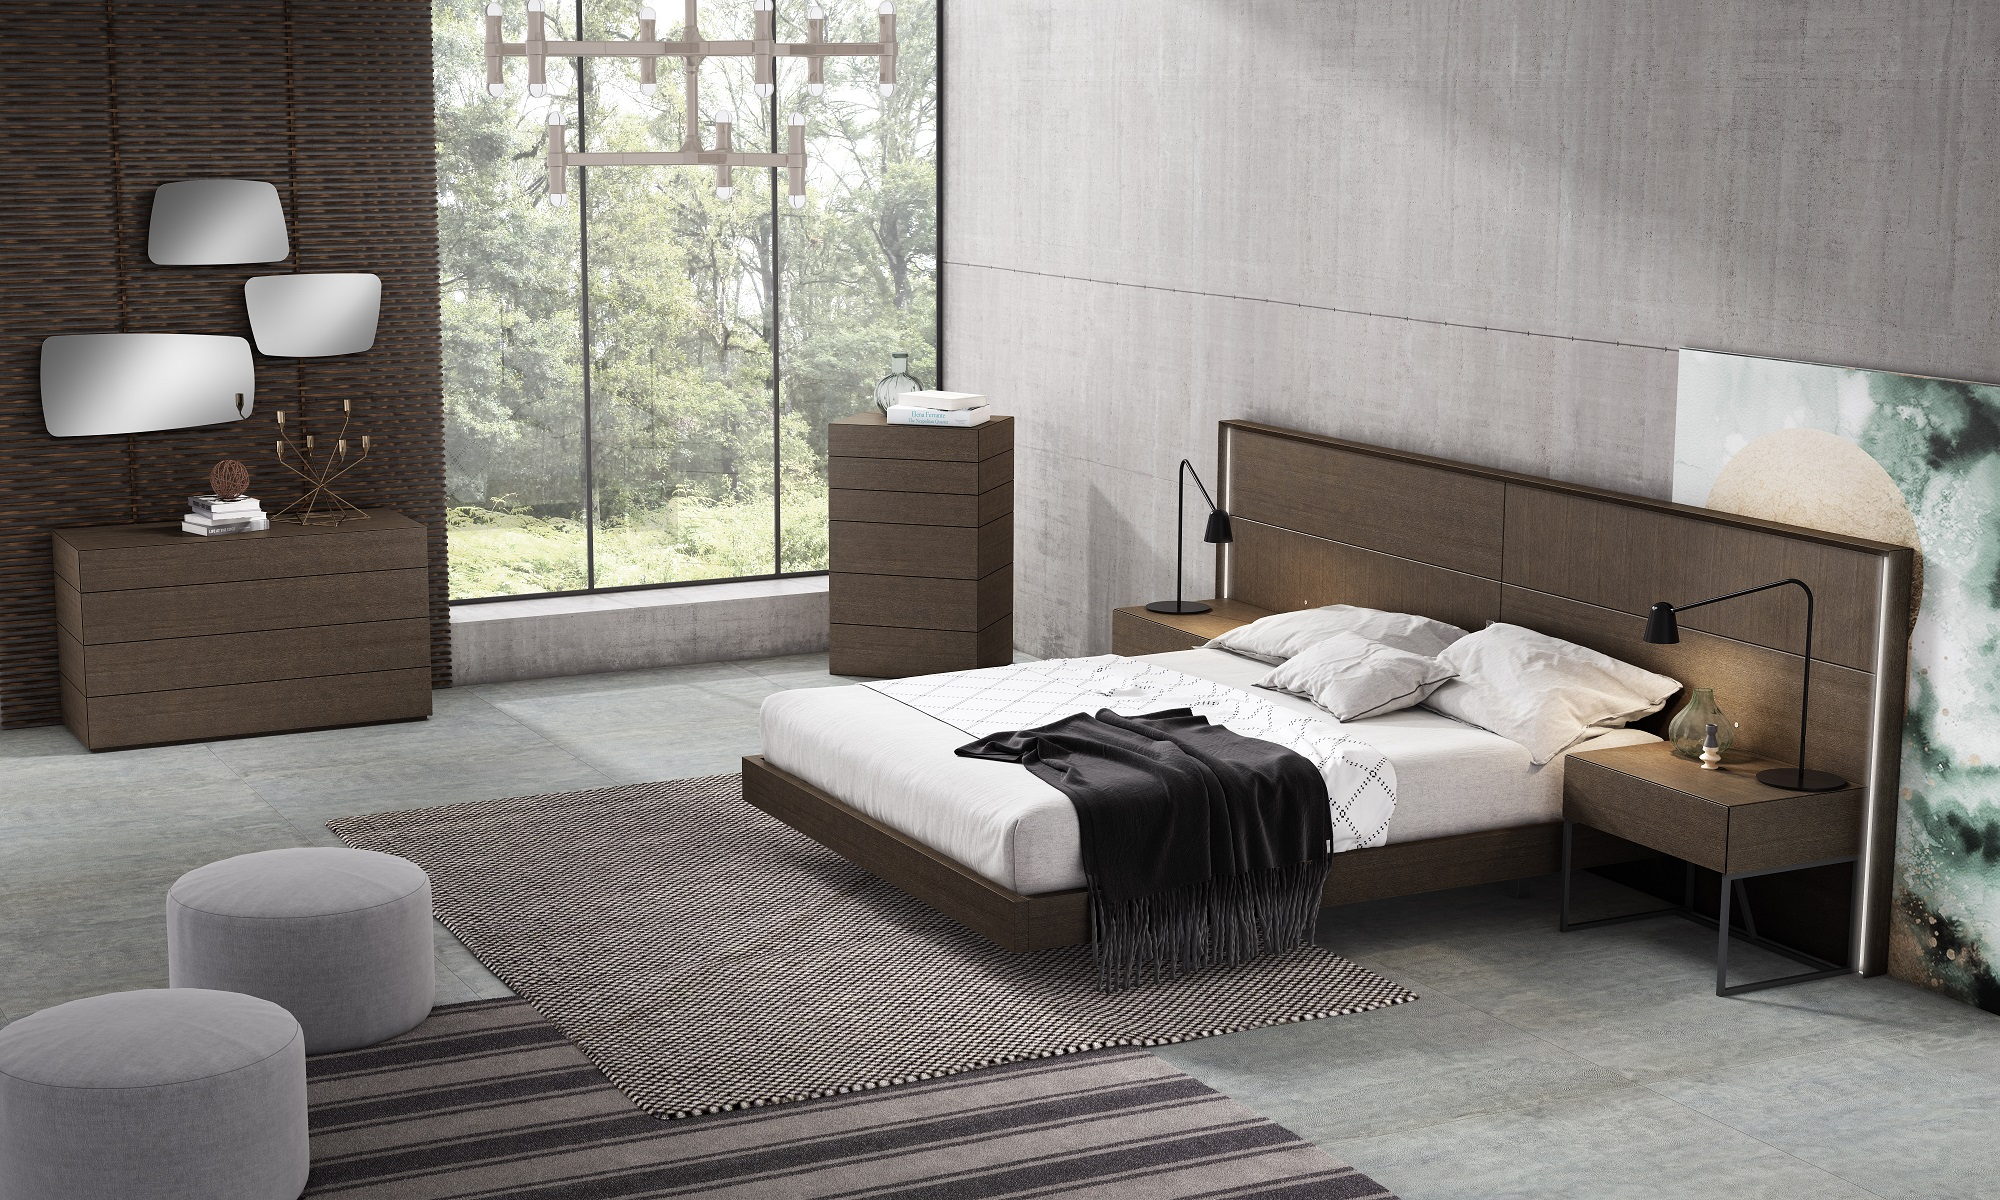 High End Modern Furniture: Stylish Wood High End Contemporary Furniture Set